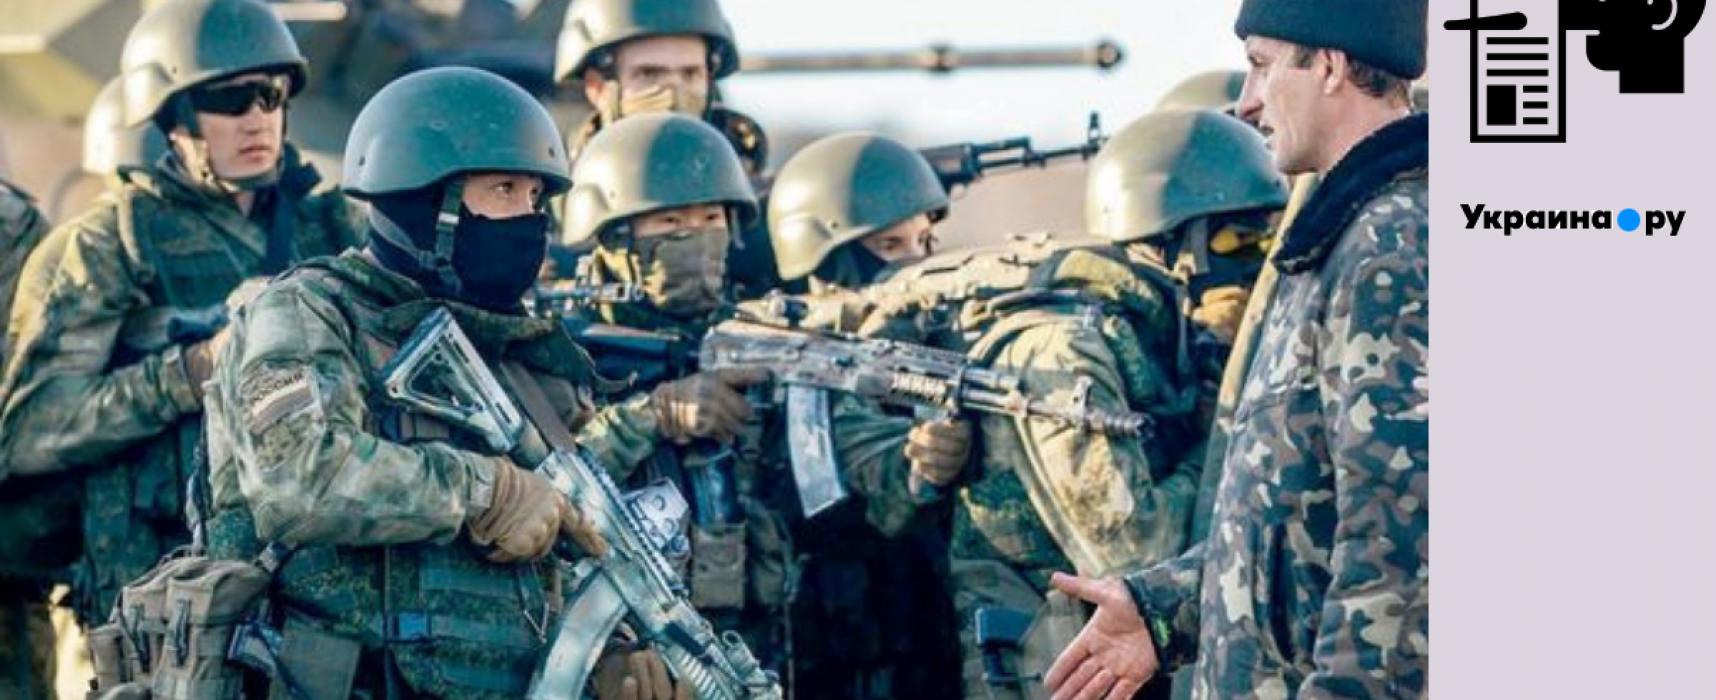 Fake: Ukrainian Deputy Minister Wants to Return Crimea with the Help of the Army